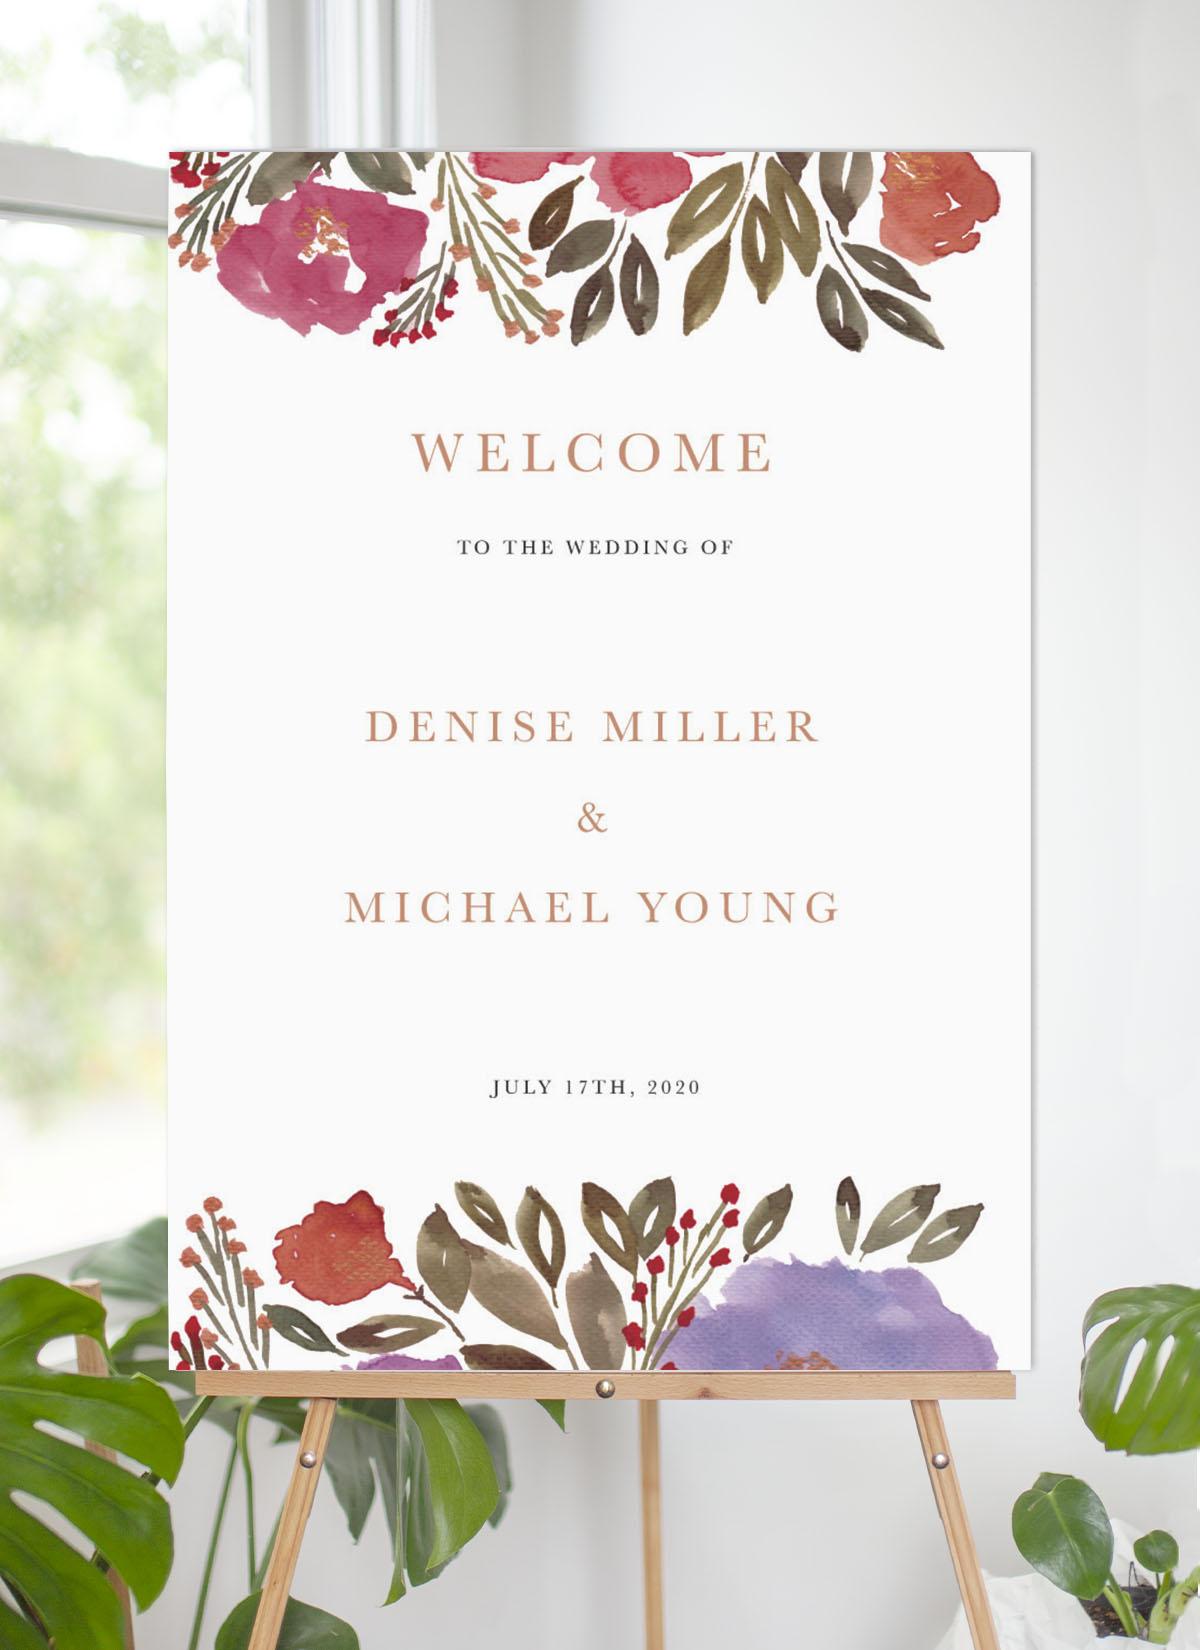 Violet Fall - Wedding Signs